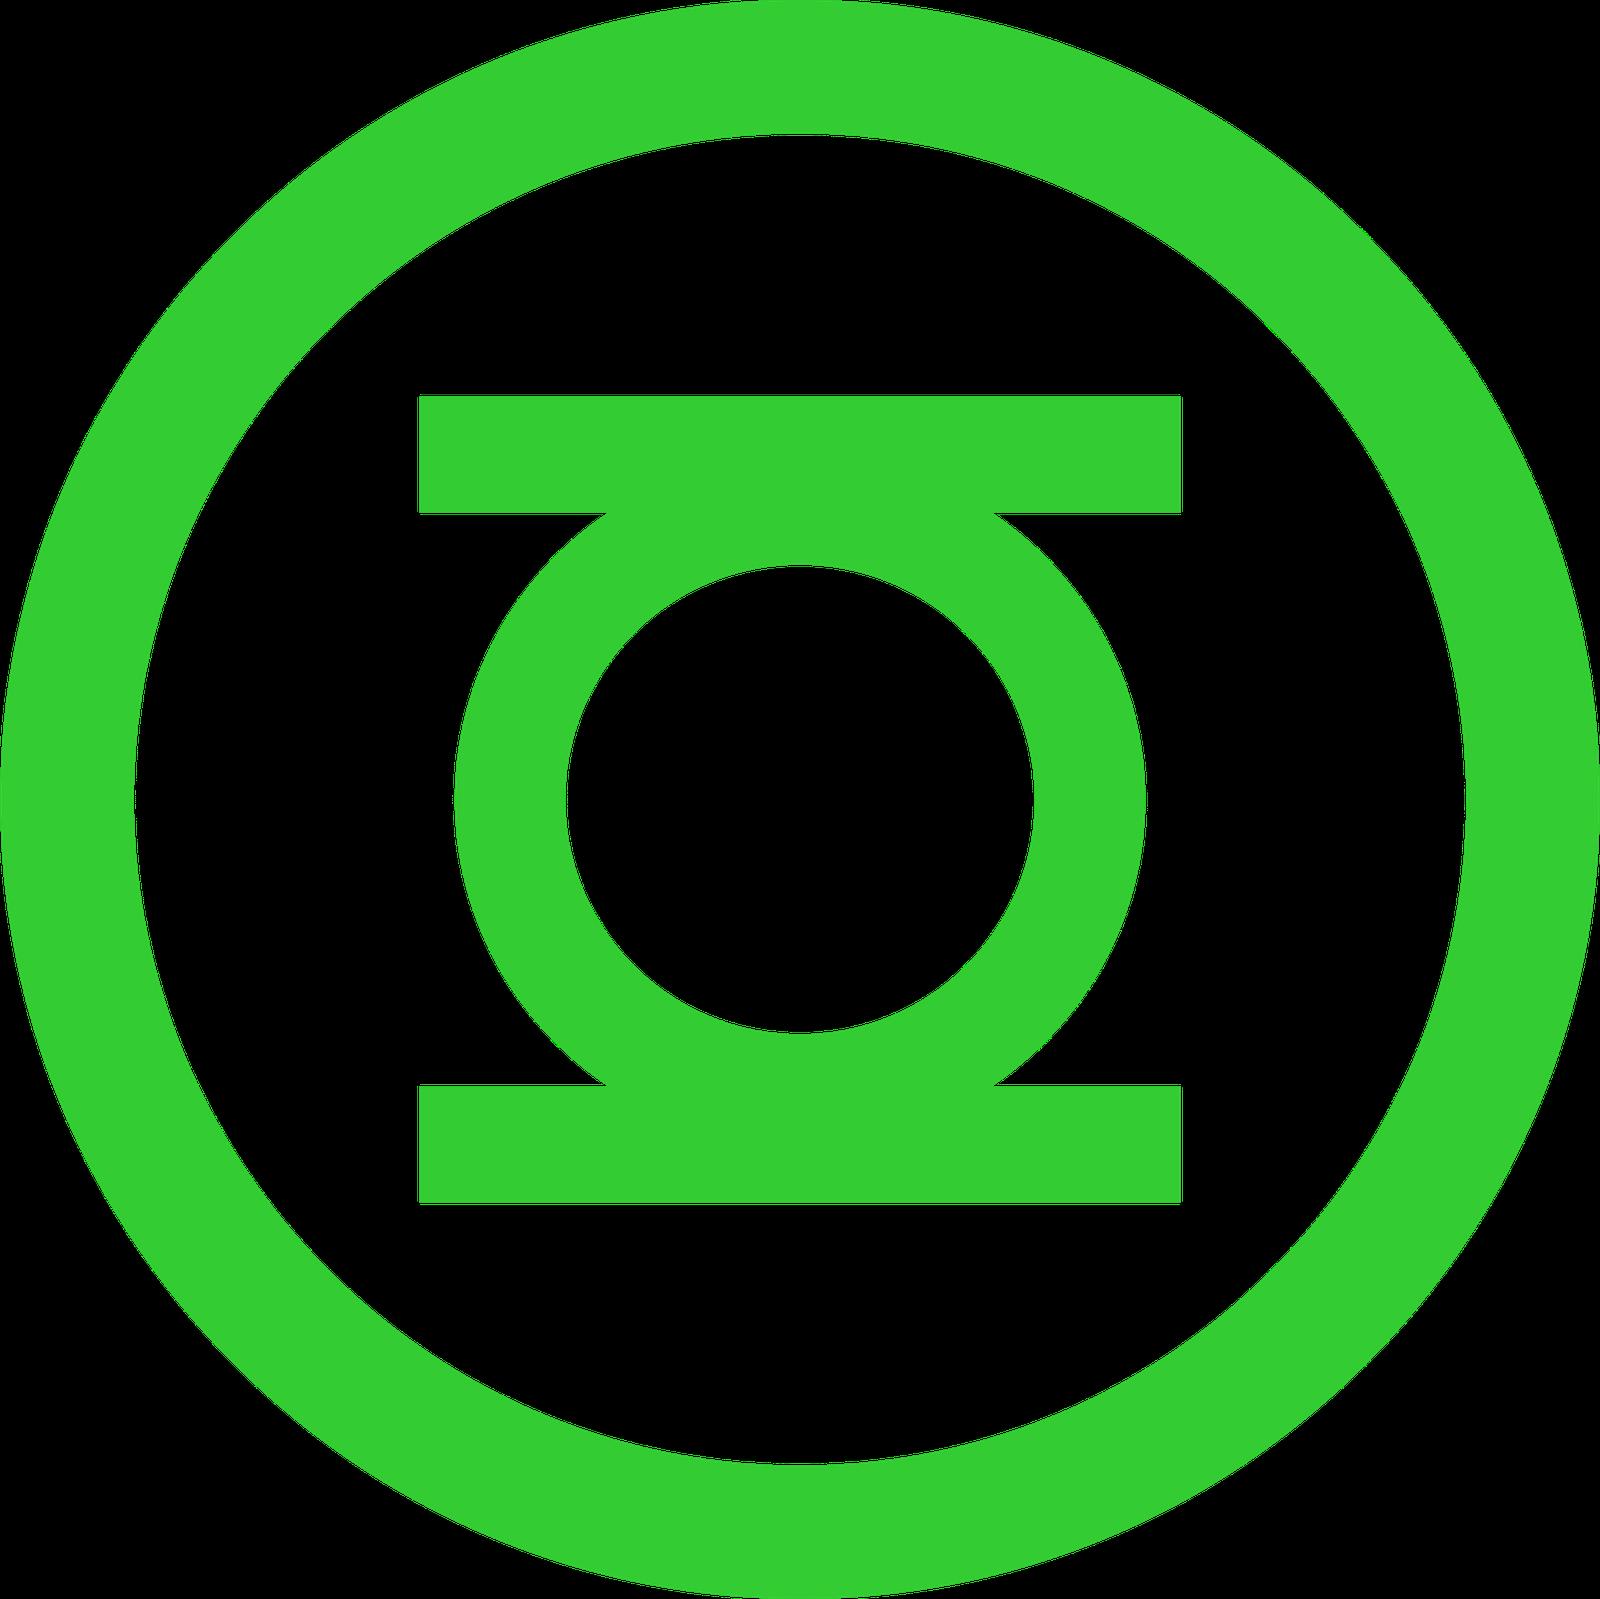 Justice League logo (free download vectors) ~ DENIZIGNKO